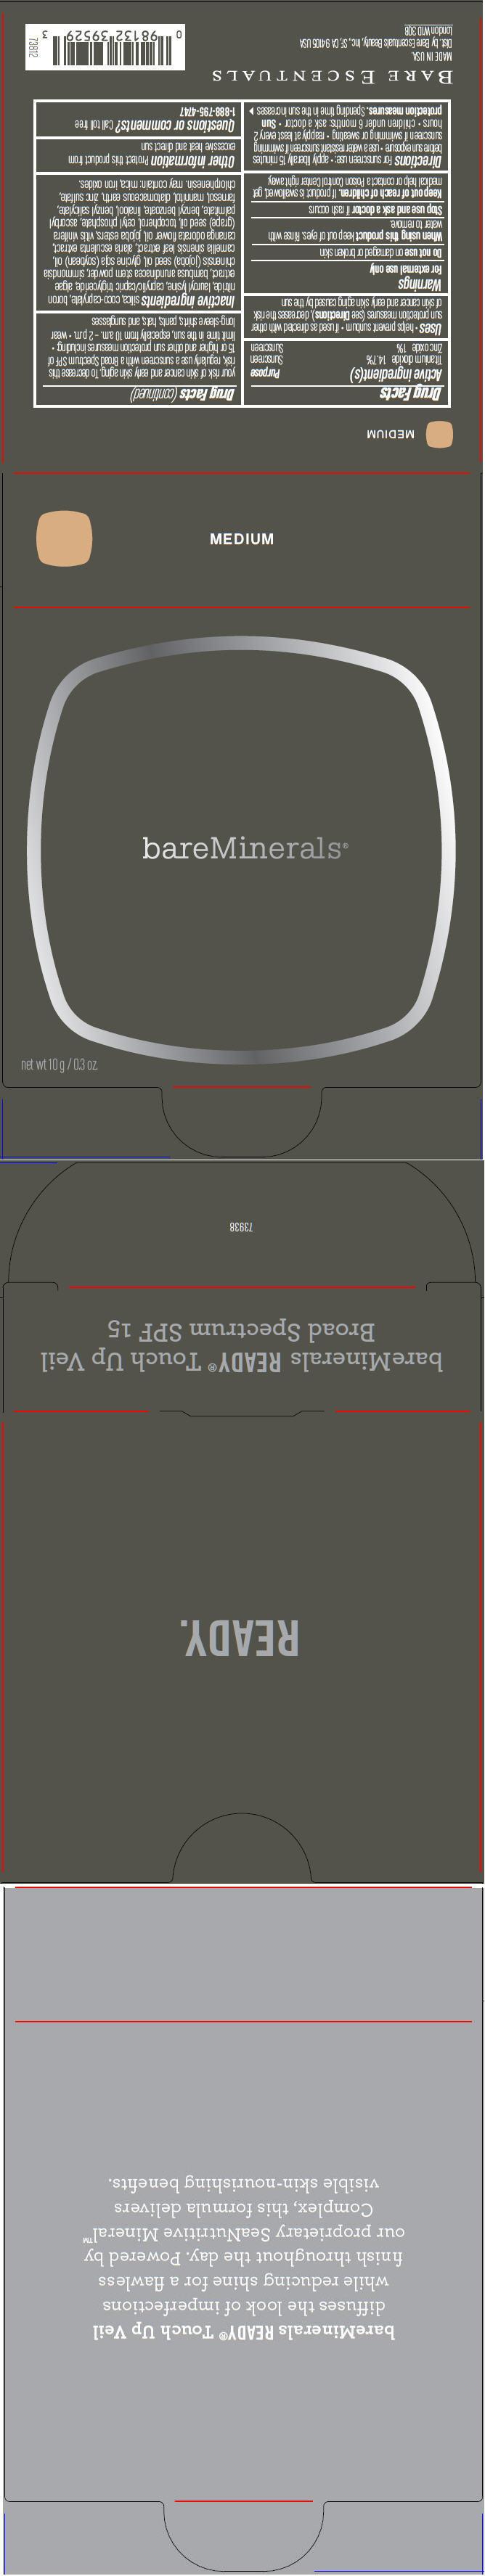 Principal Display Panel - 10 g Tray Carton - Medium